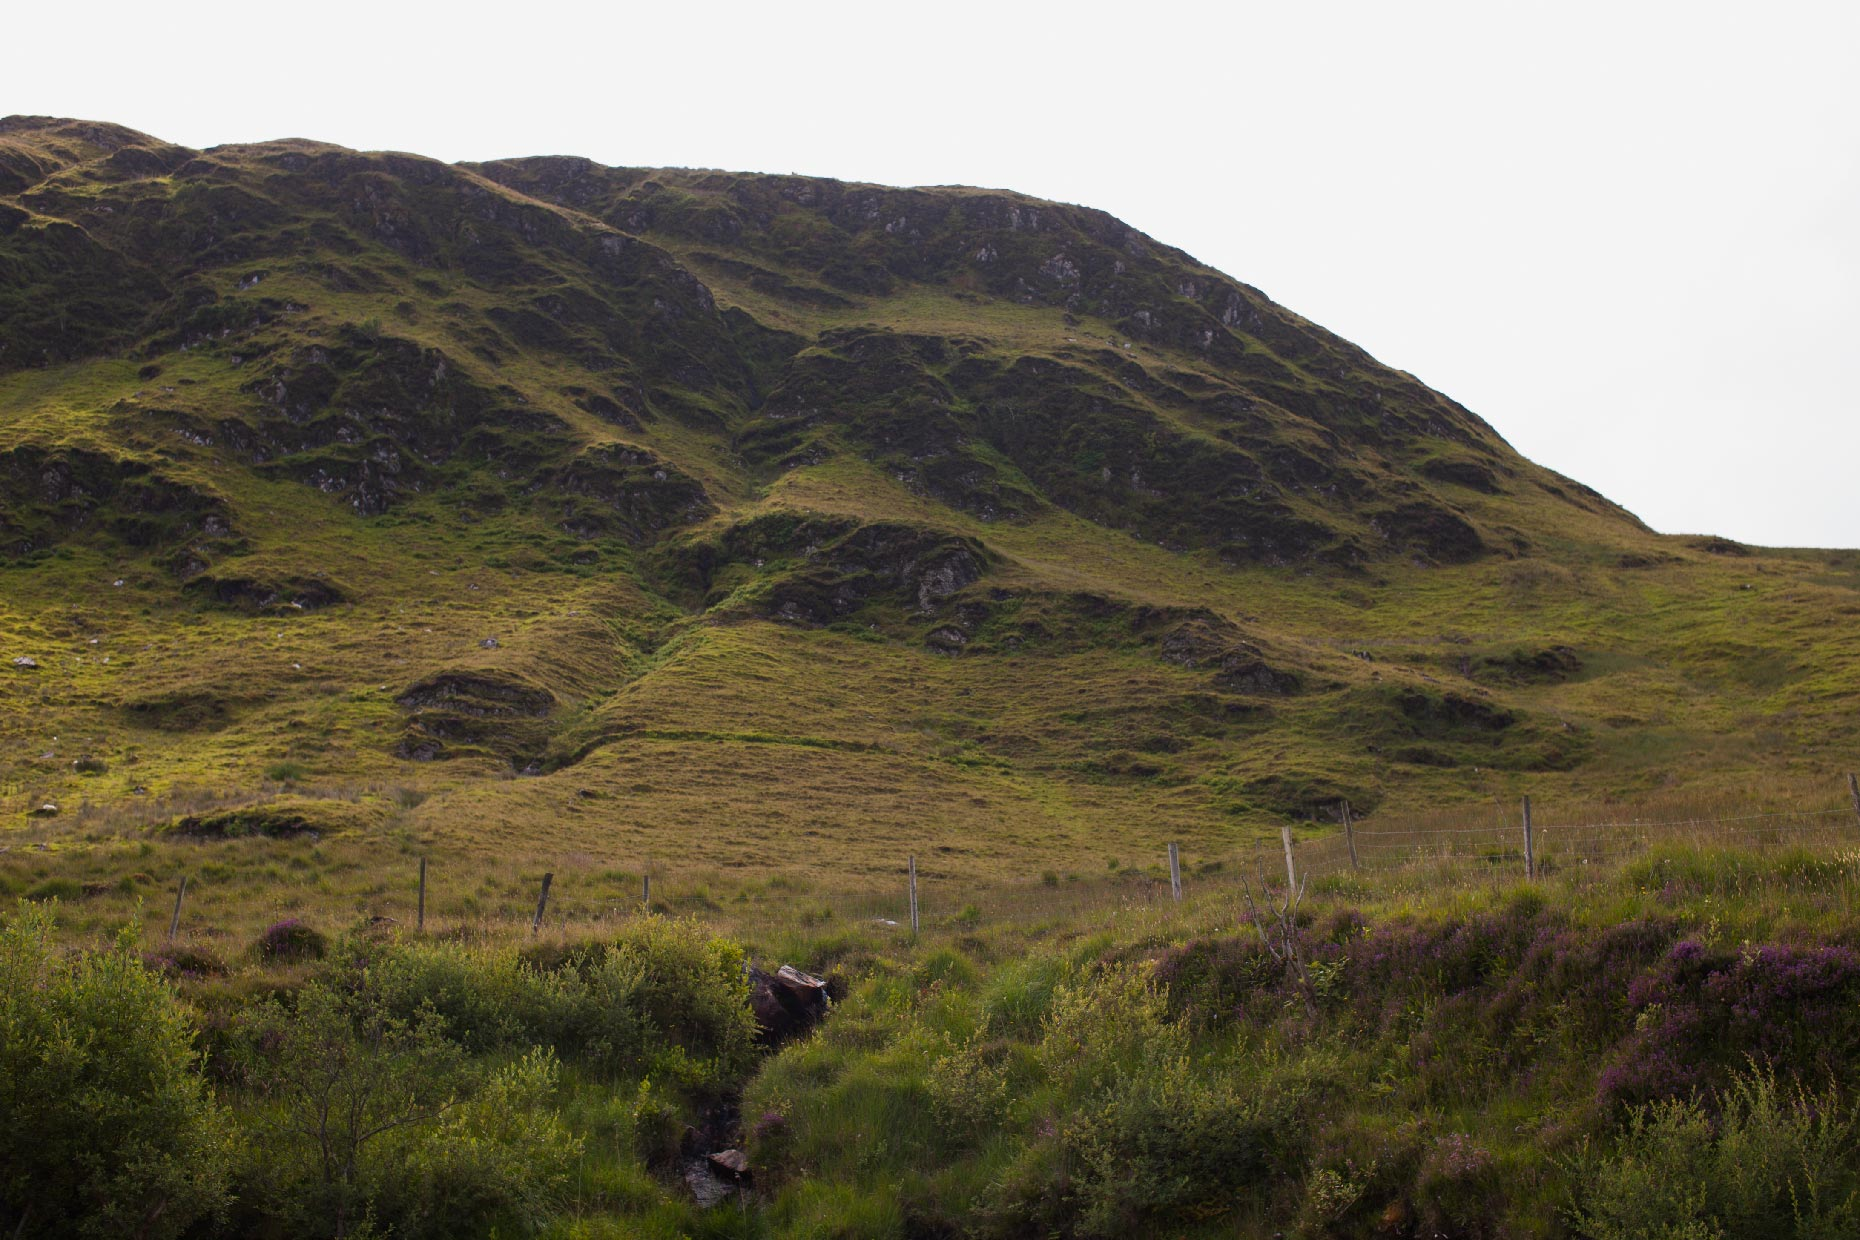 Stacey Van Berkel Photography I Green hills I Donegal, Ireland